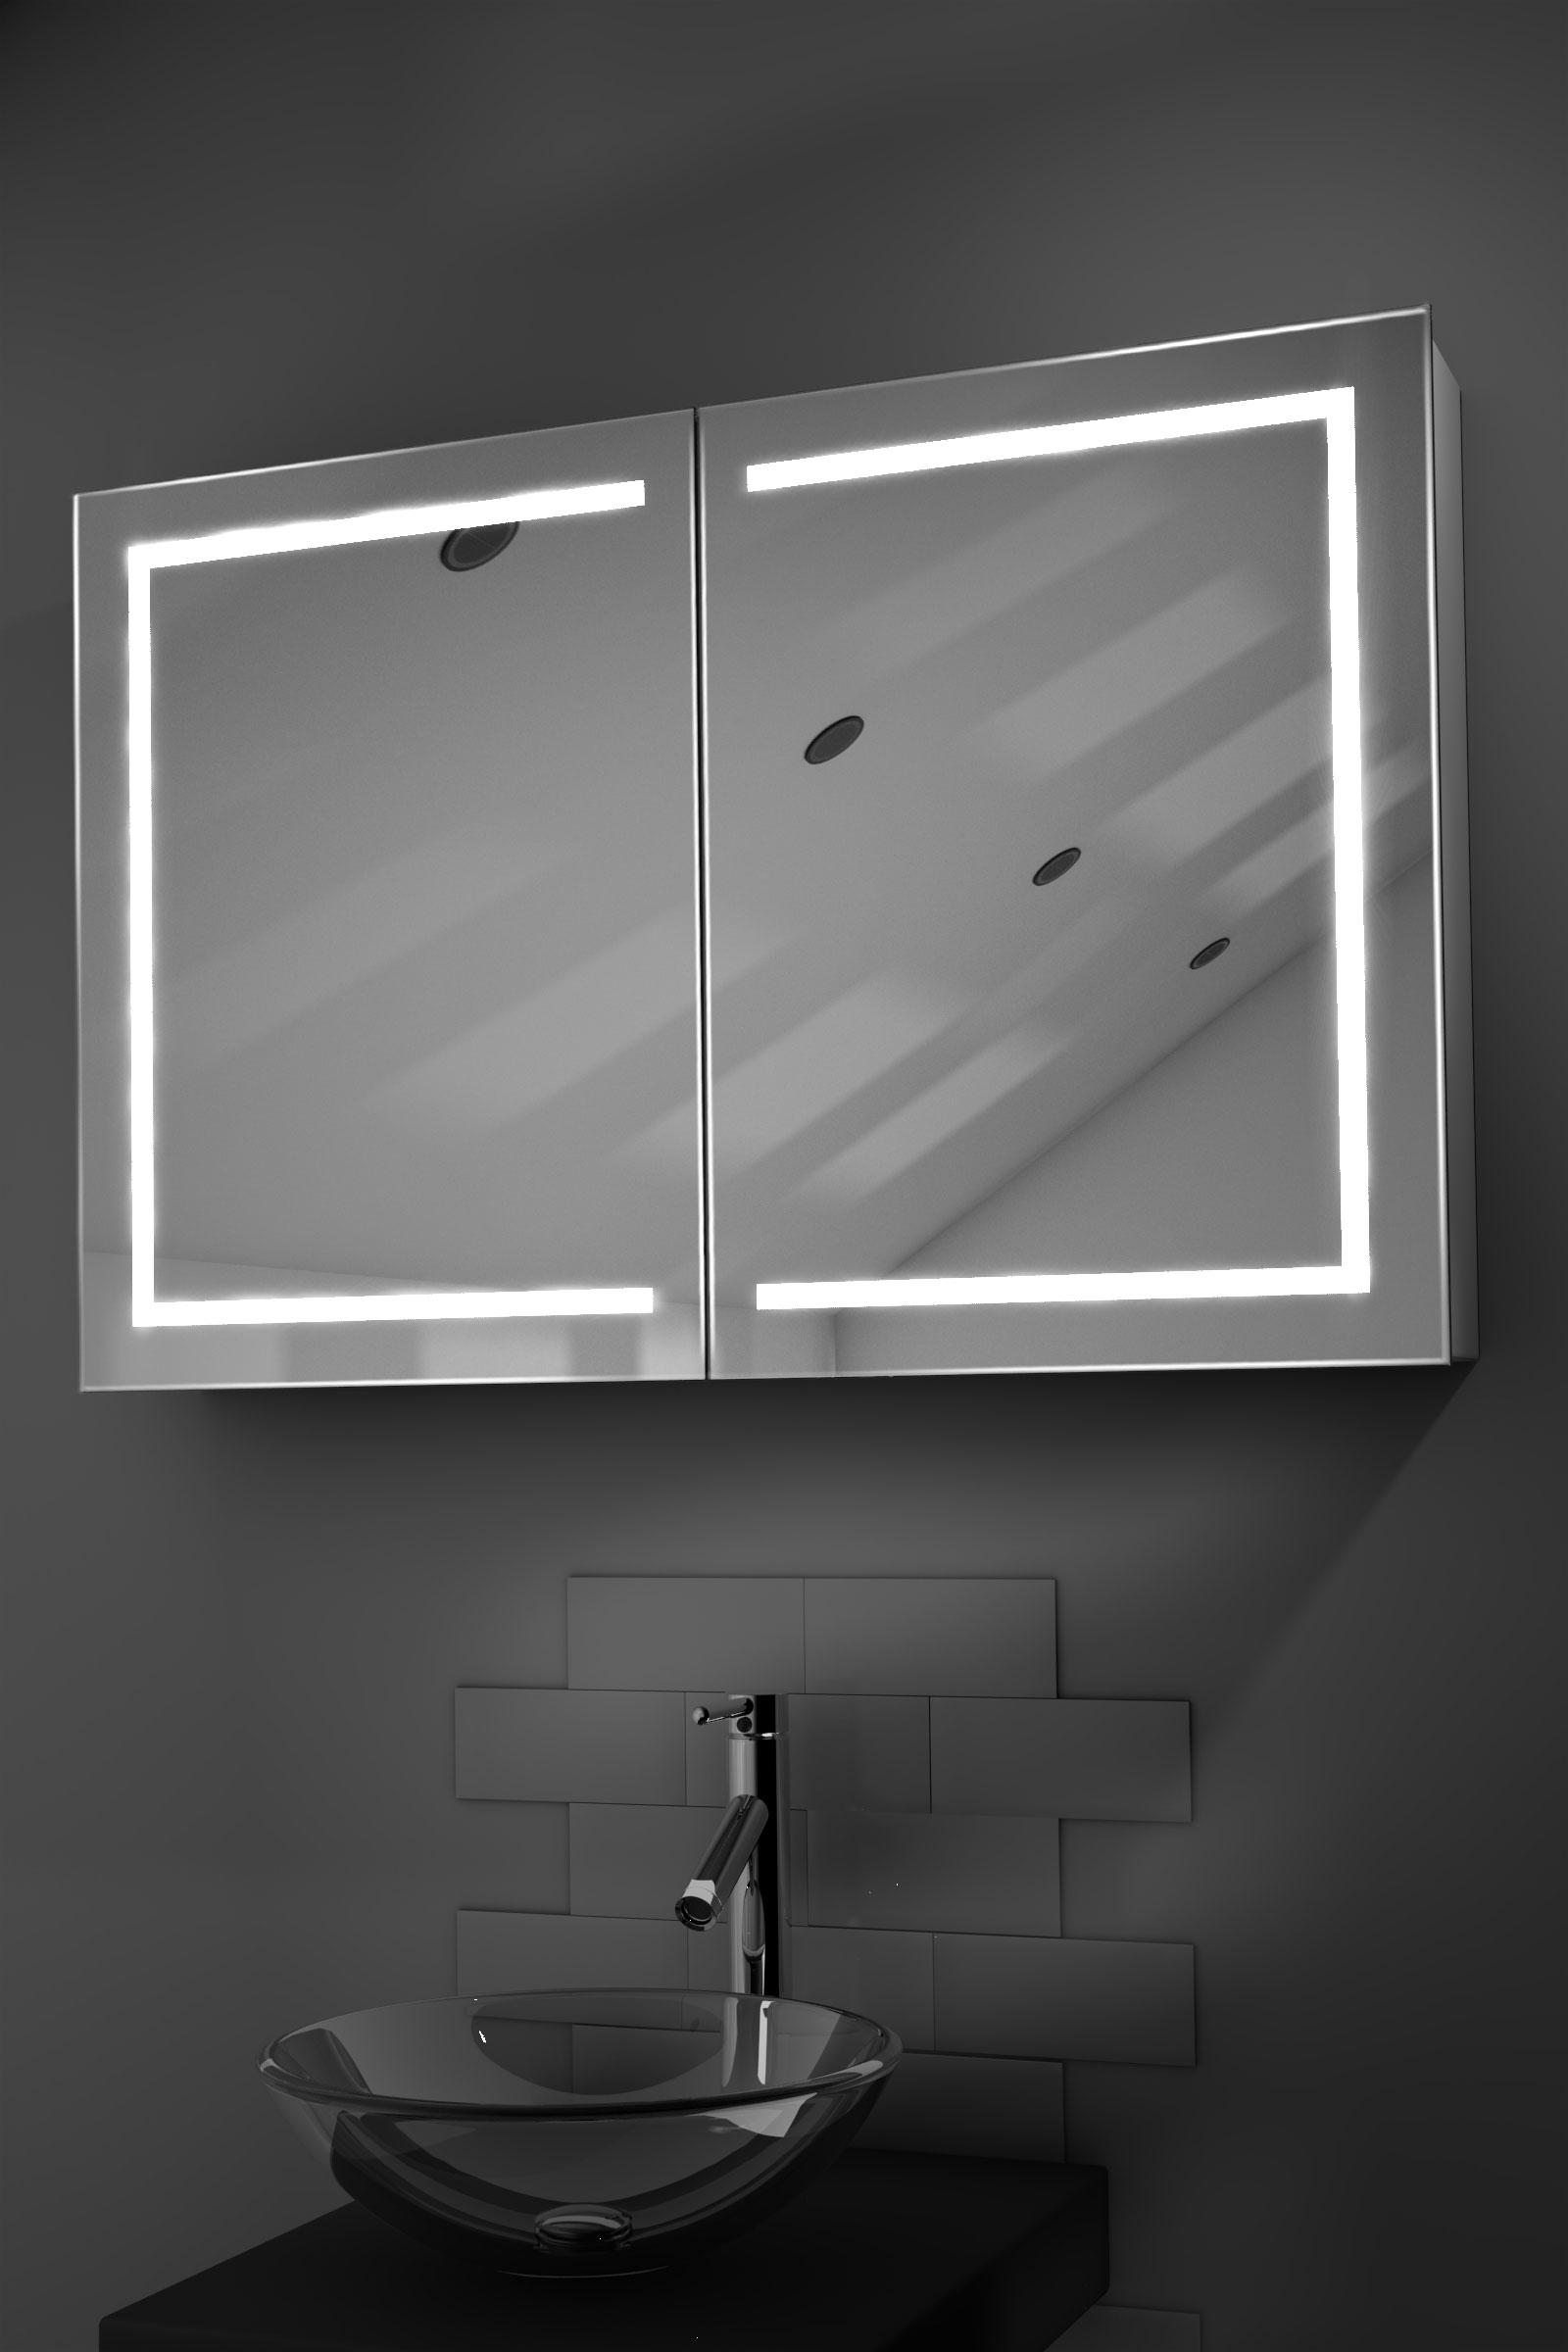 Lea Led Bathroom Cabinet With Demister Pad Sensor